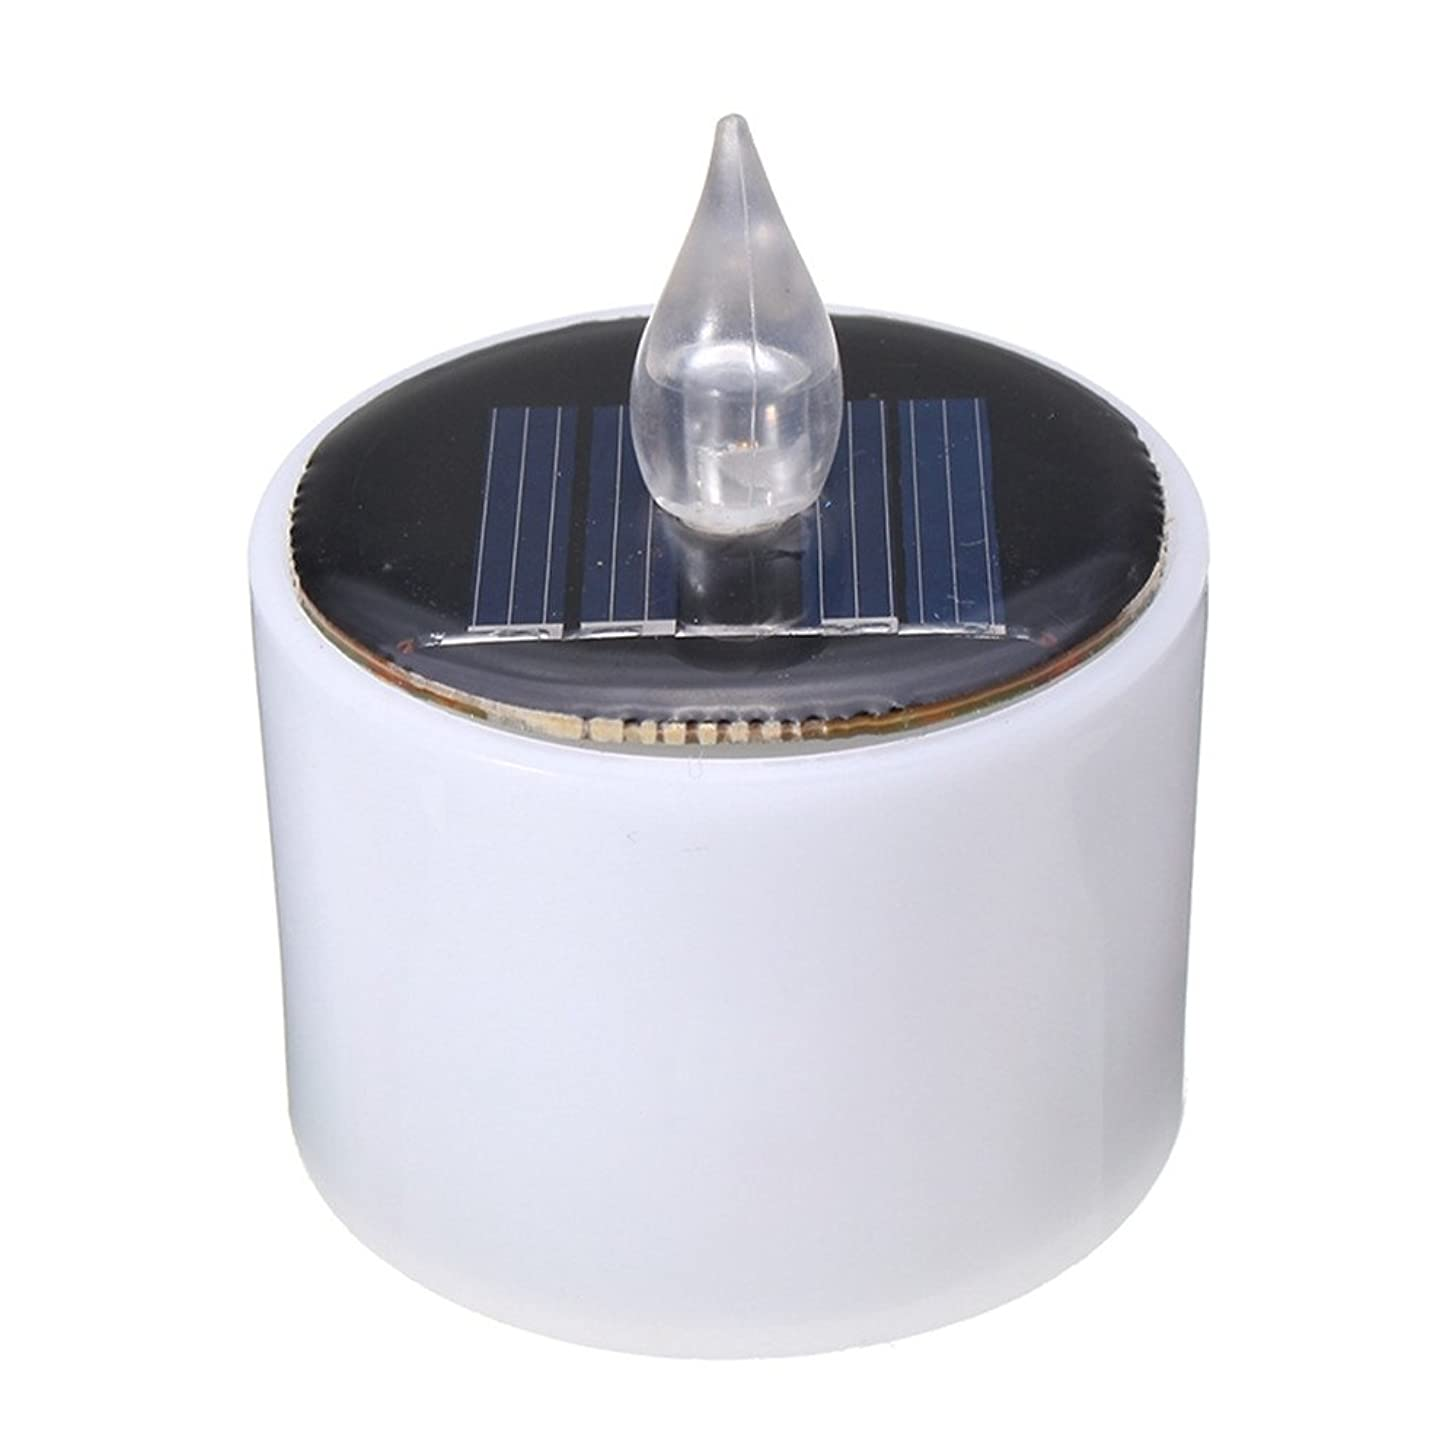 Ruanyi Energy Battery Warm Flicker Flameless LED Solar Light Solar Powered Flashing Candle Tea Light Wedding Home Decor LED lighting